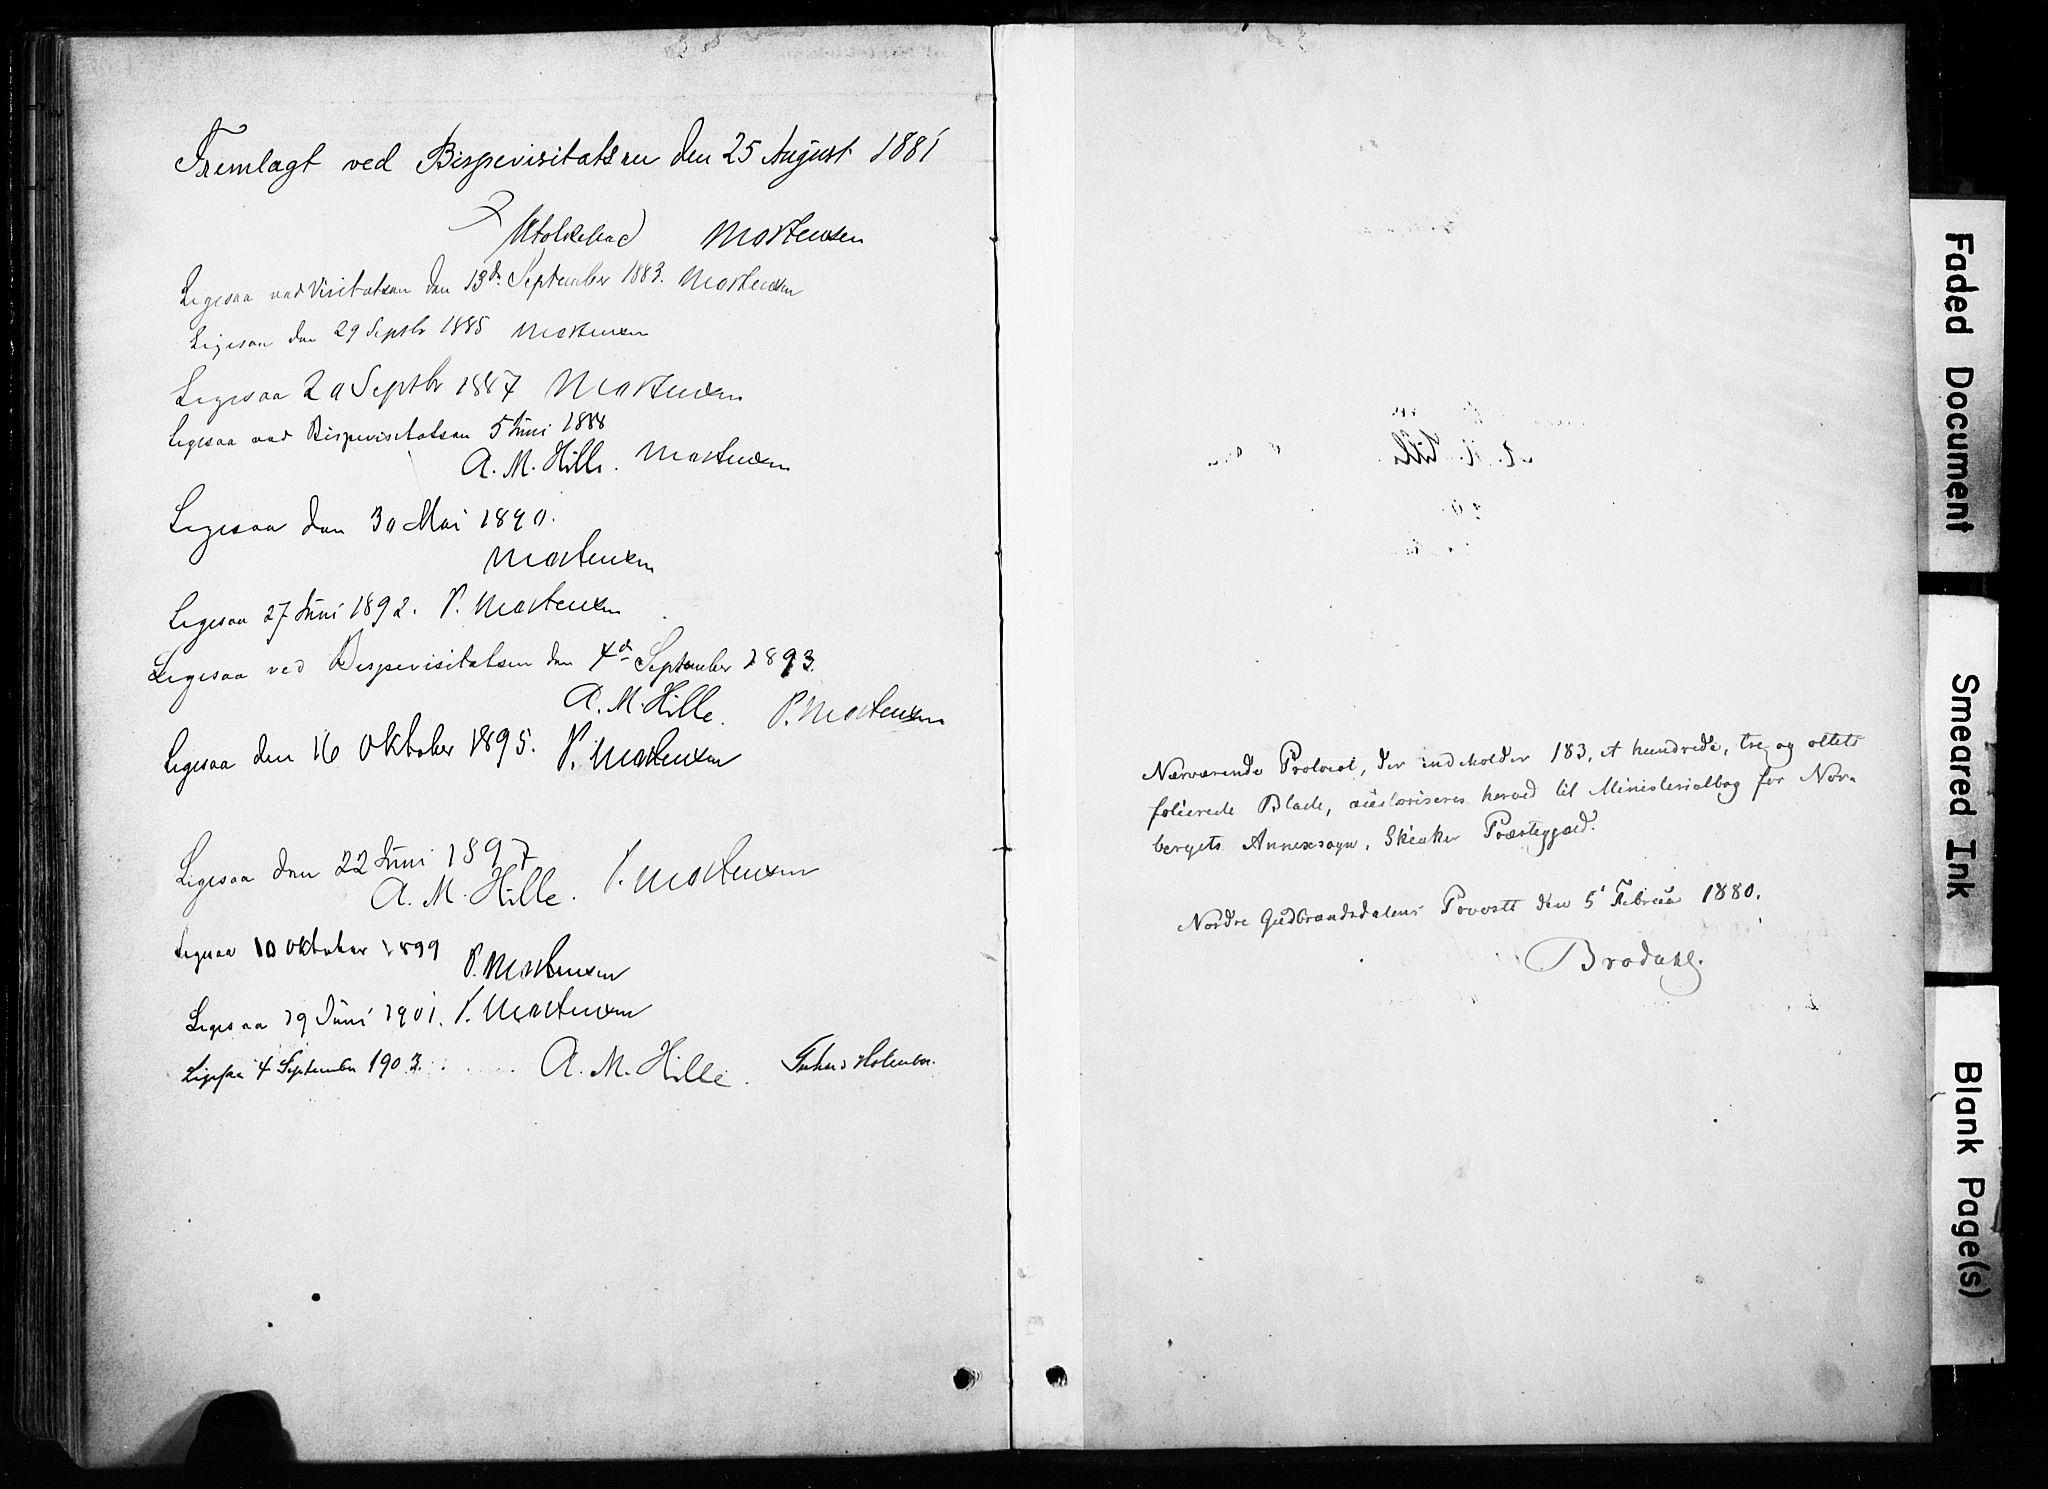 SAH, Skjåk prestekontor, Ministerialbok nr. 4, 1880-1904